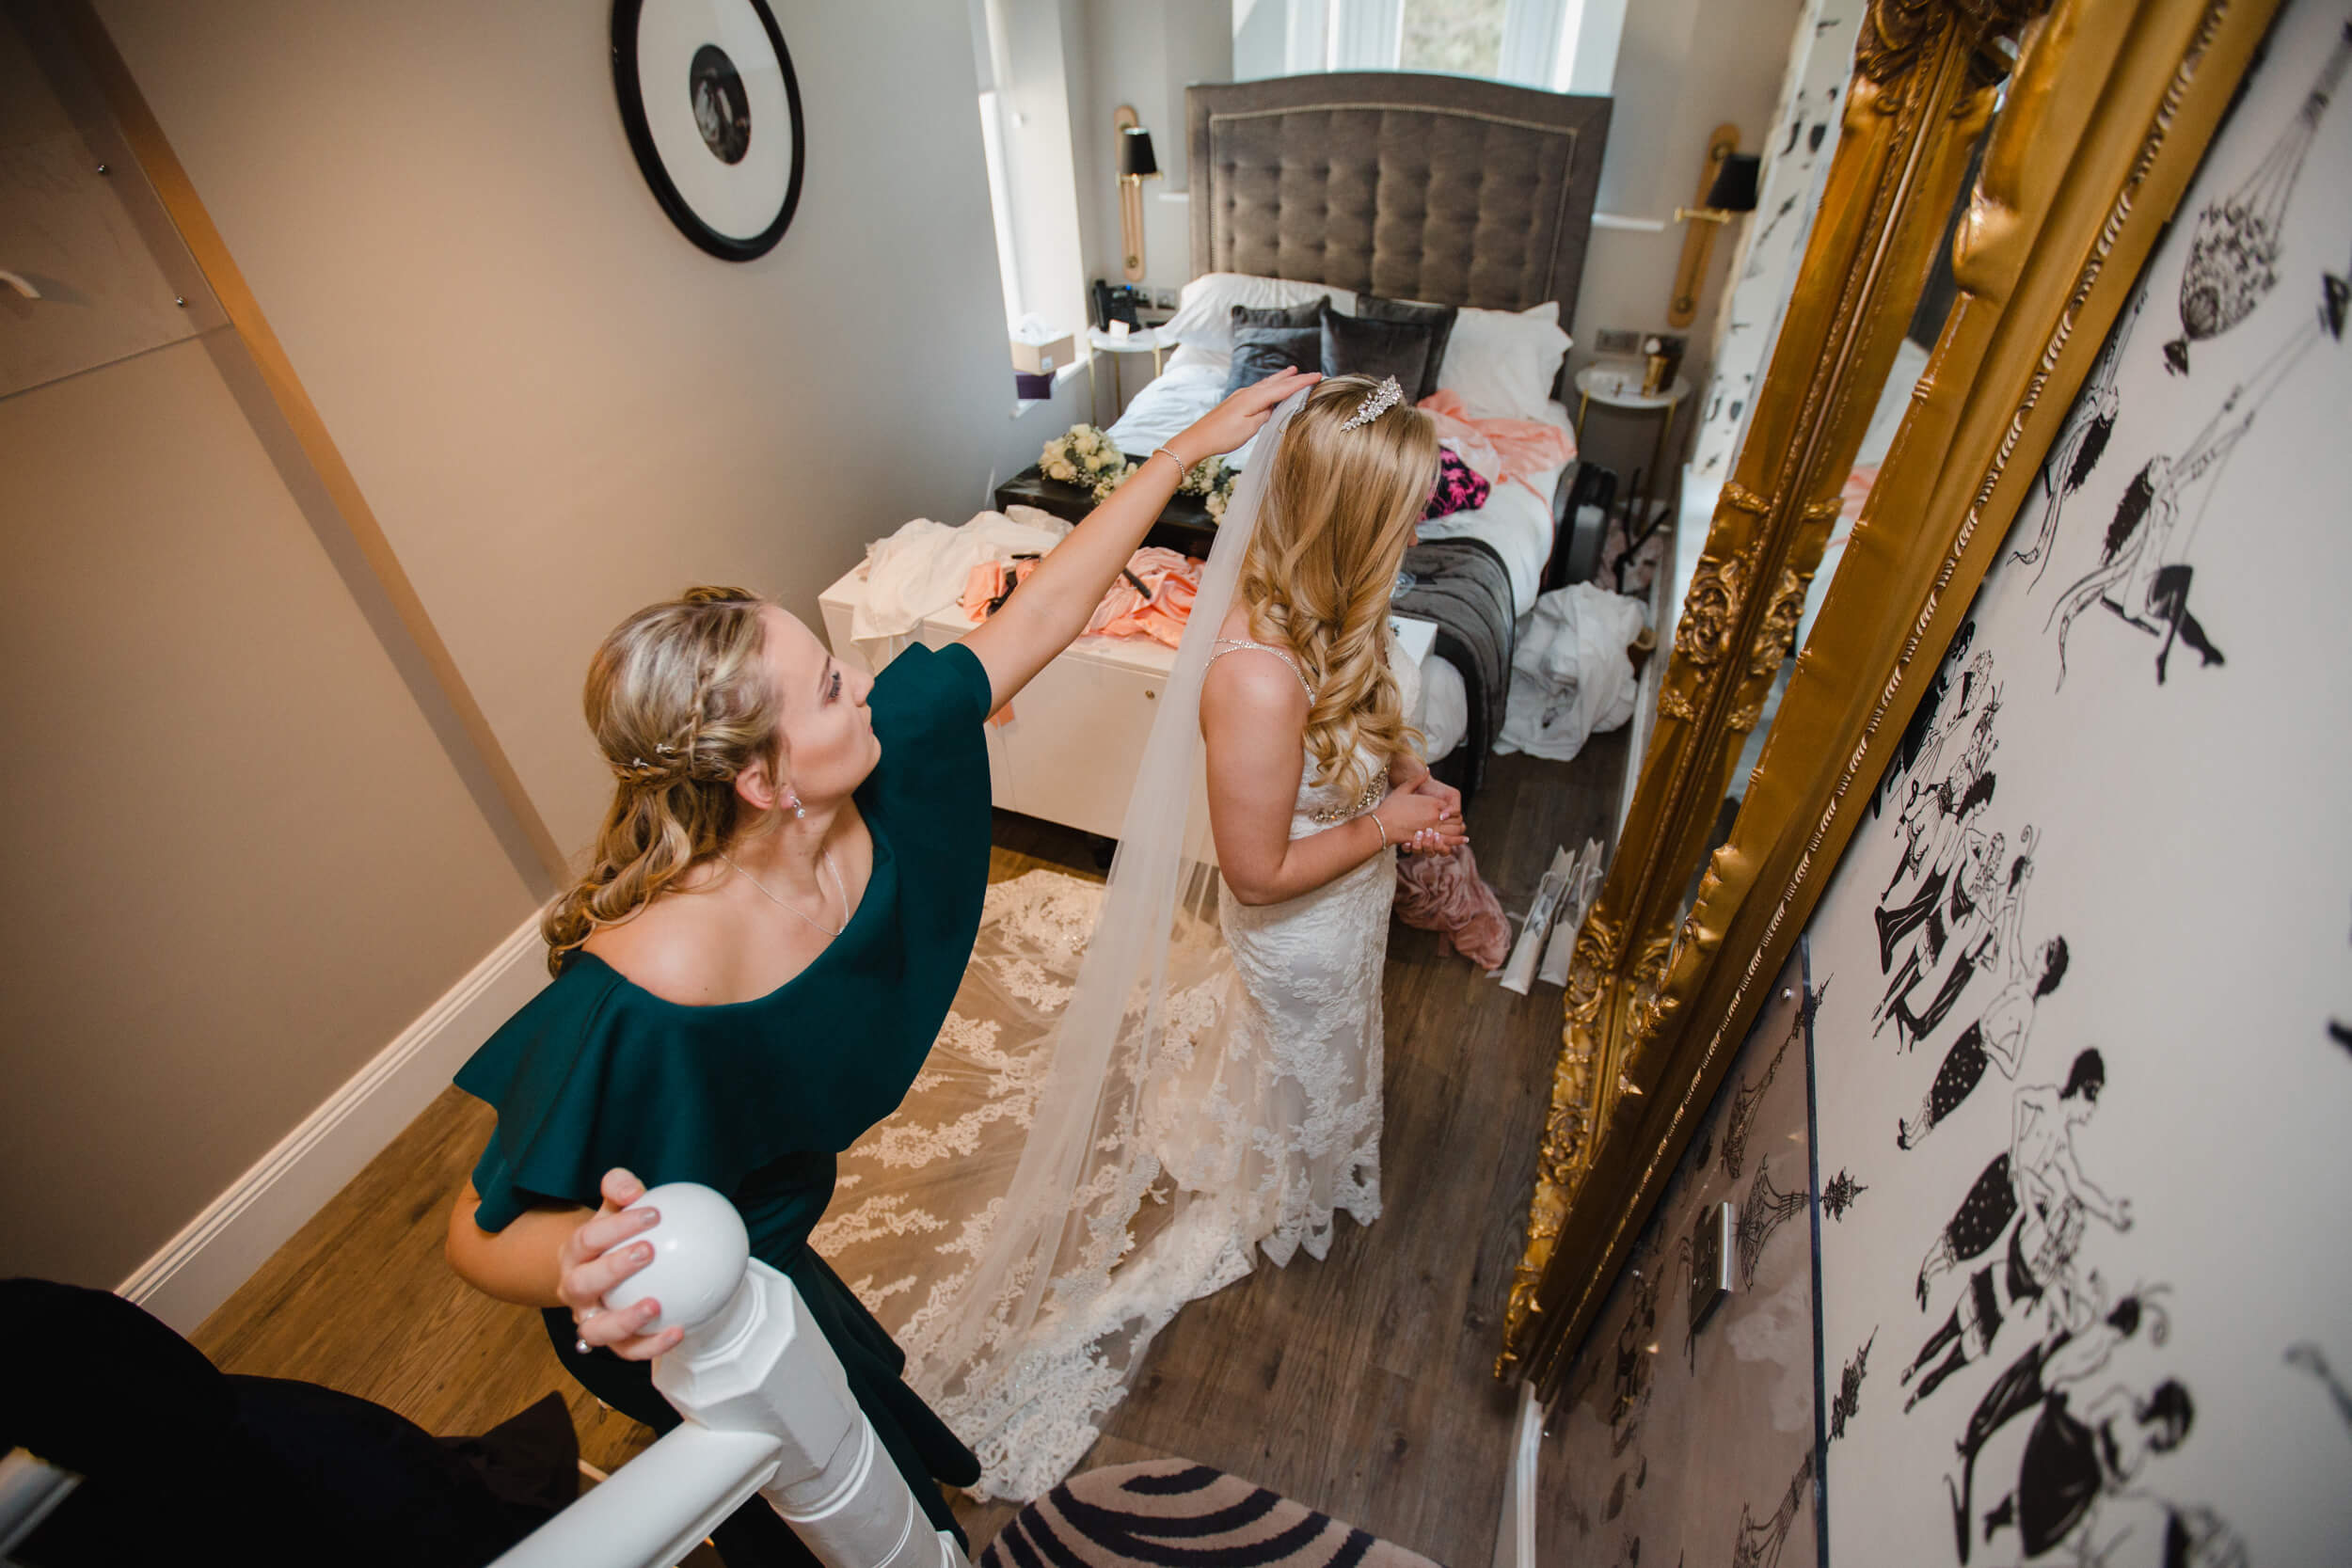 bridesmaid attaching veil to brides headpiece tiara during preparation